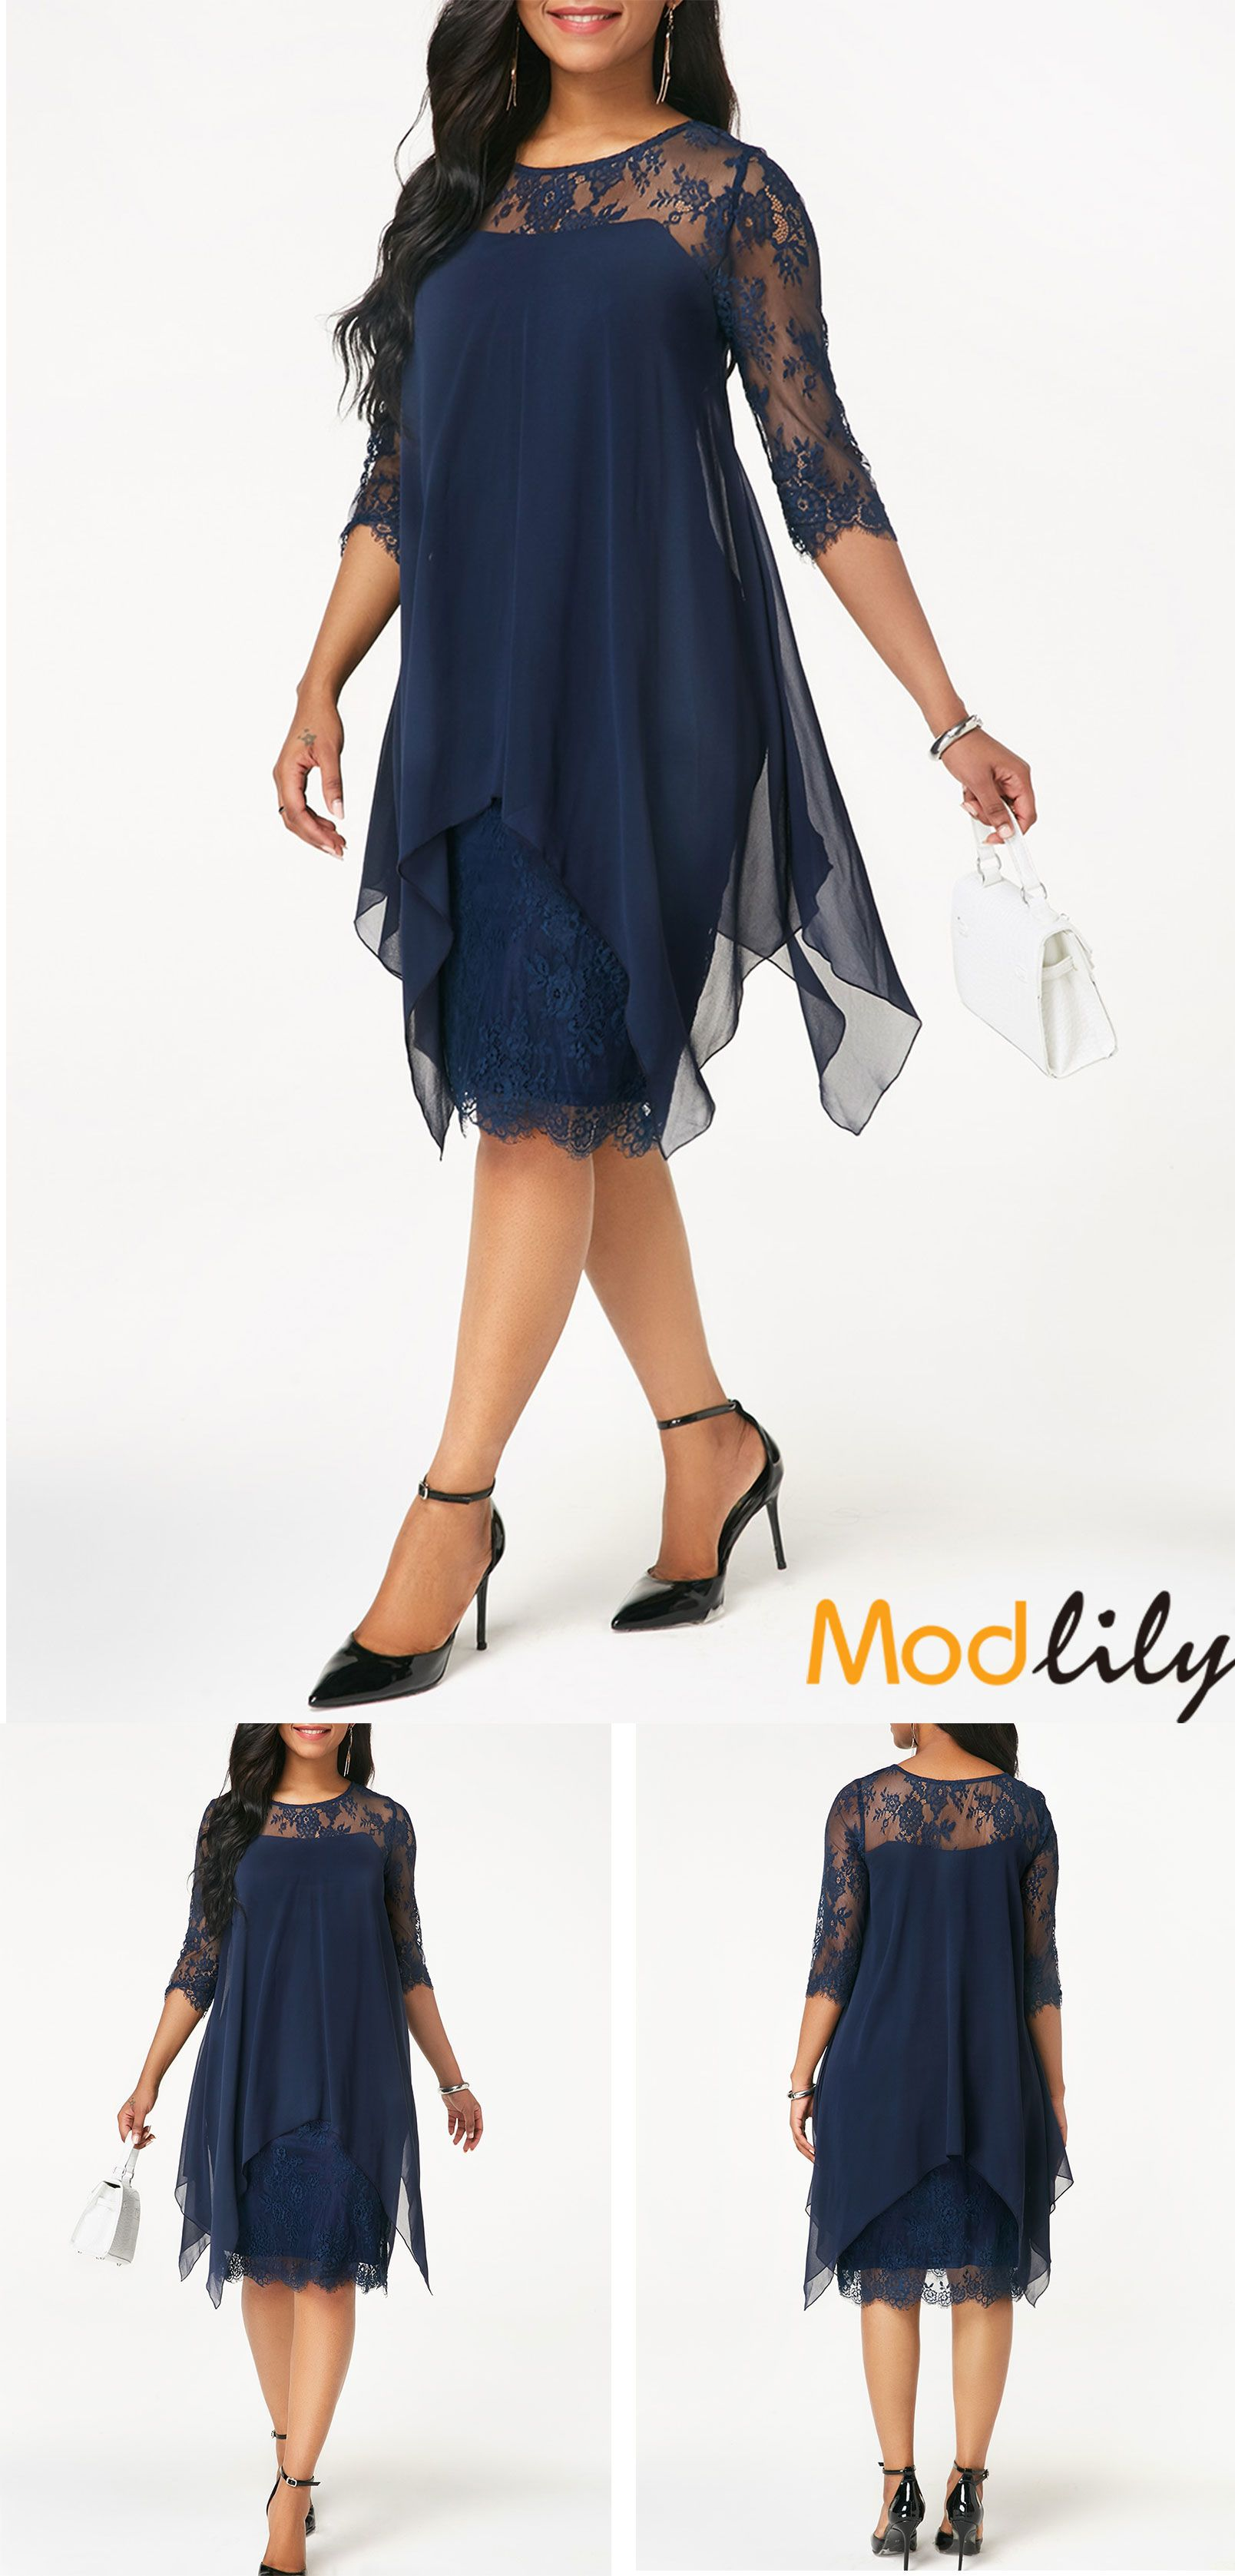 Lace dress navy  Navy Three Quarter Sleeve Chiffon Overlay Lace Dress  Dresses